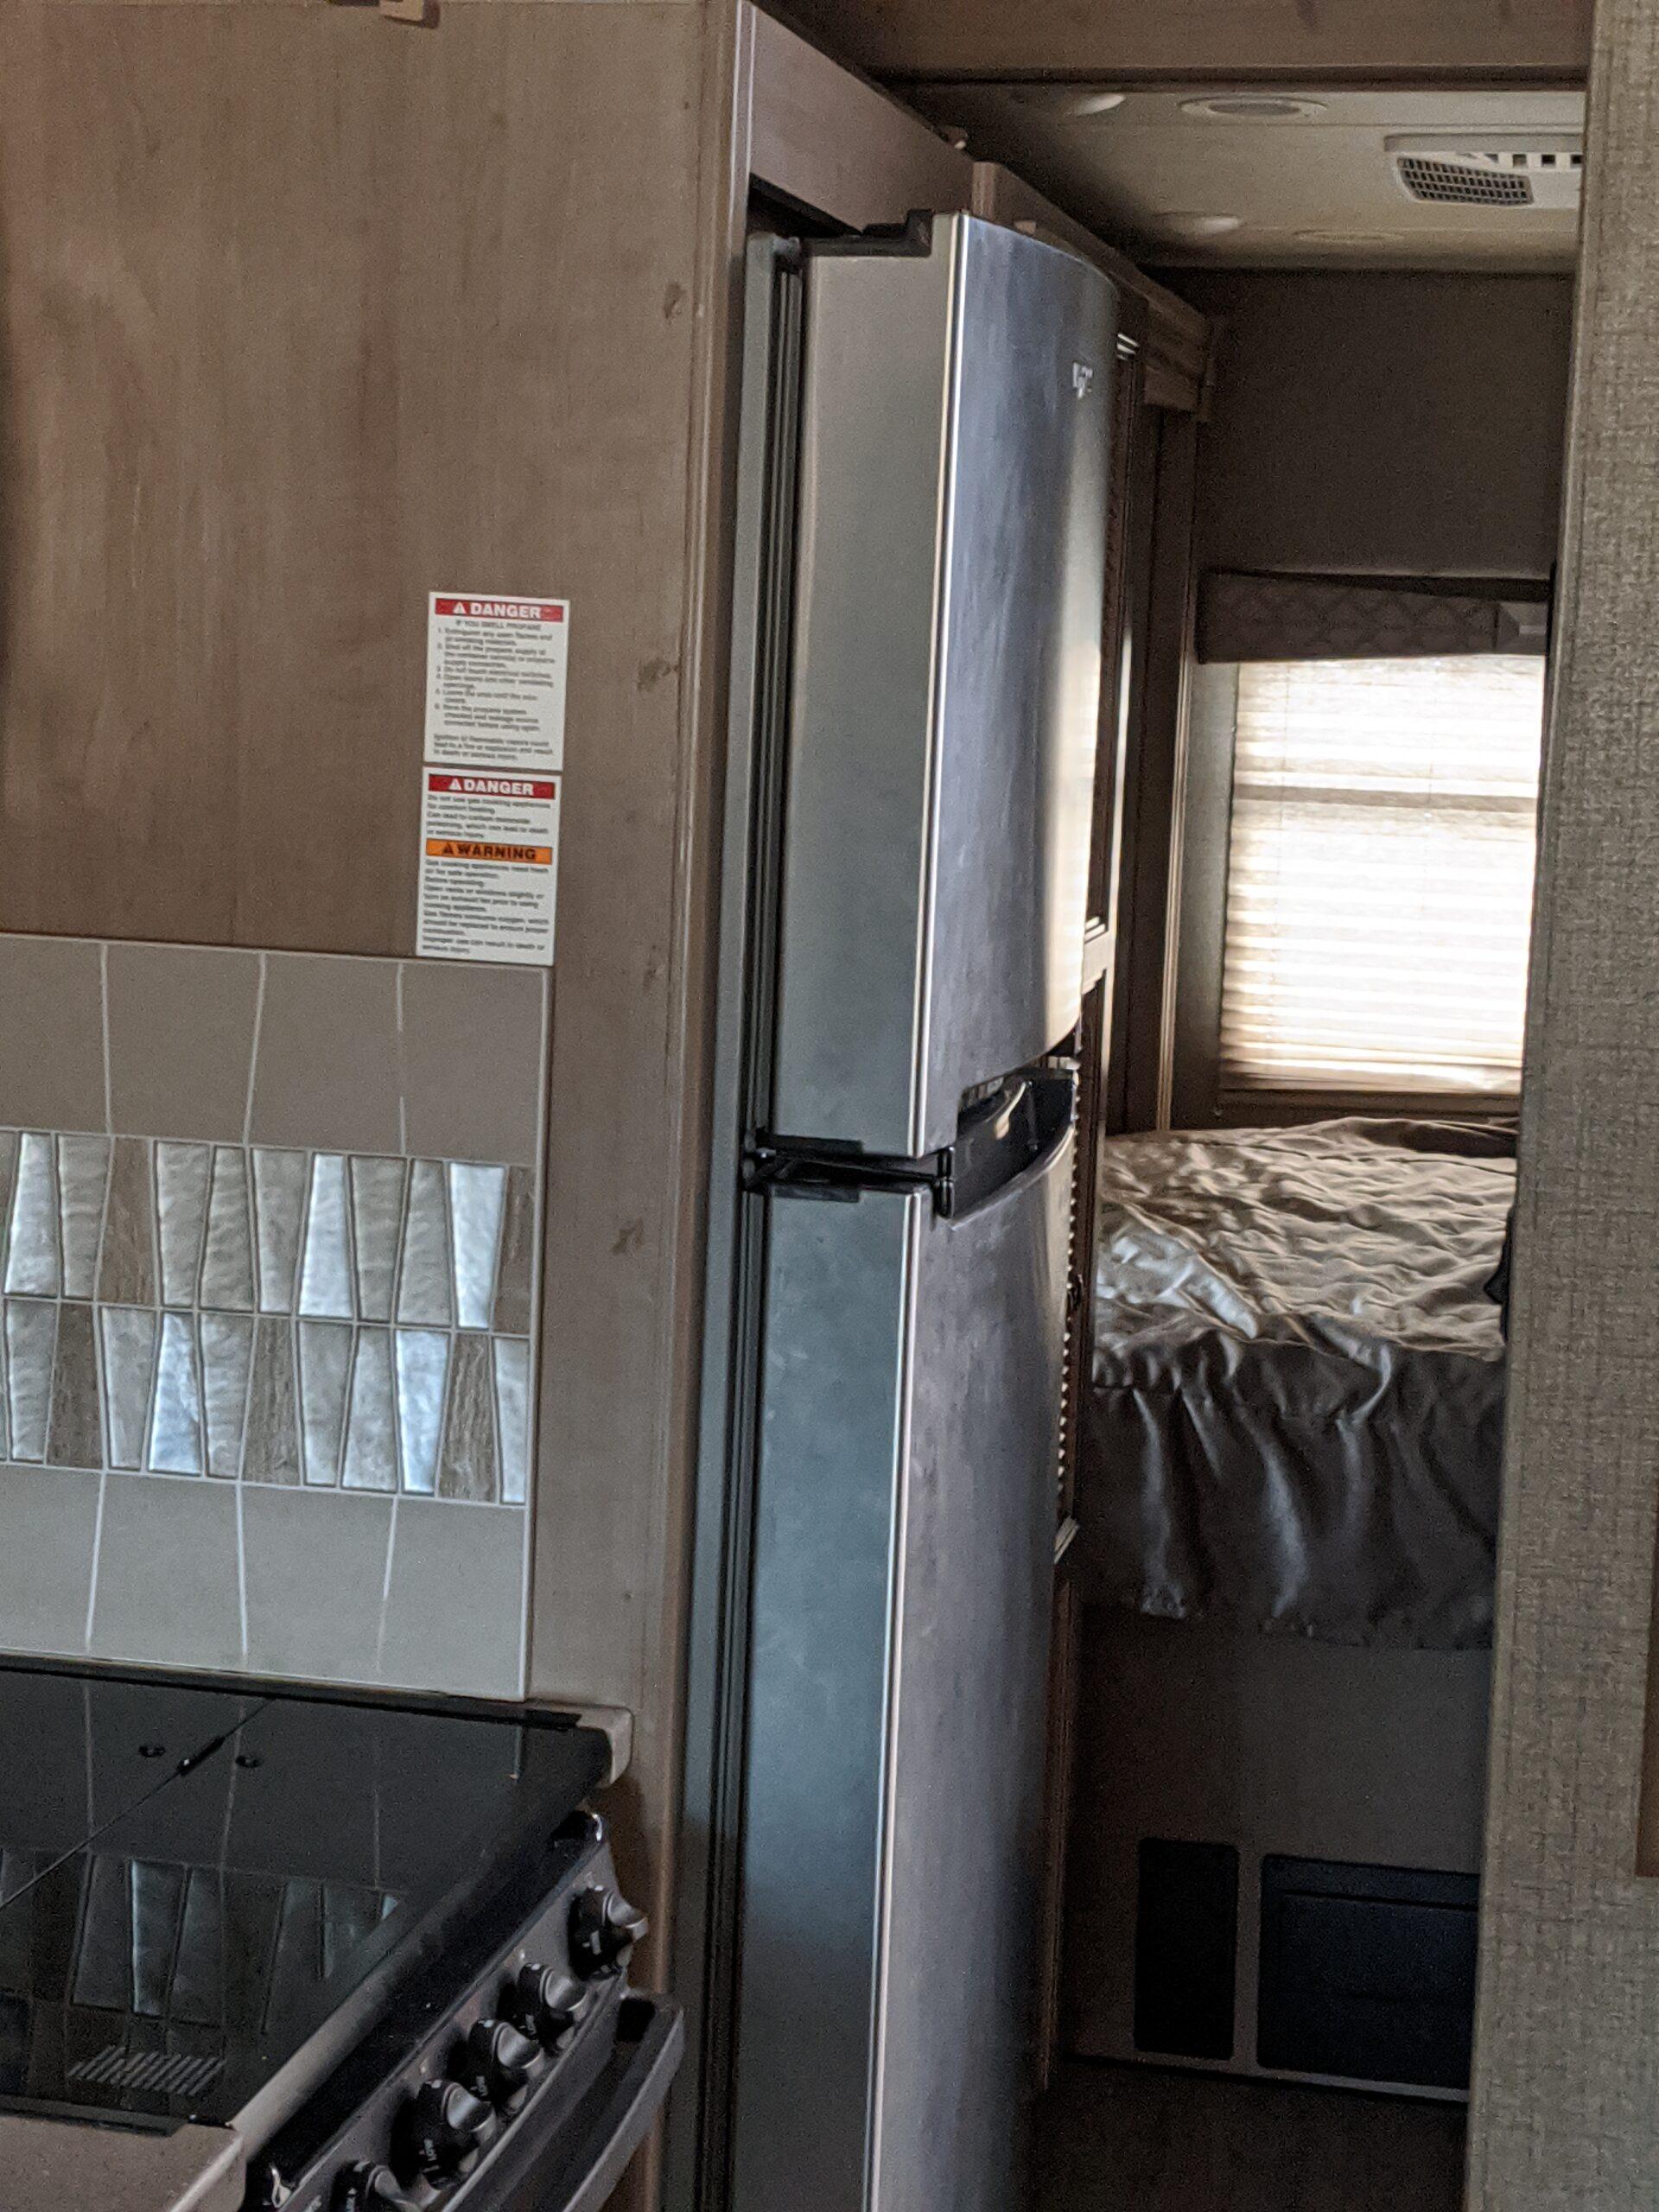 View of a 34R Windsport RV Rental refrigerator